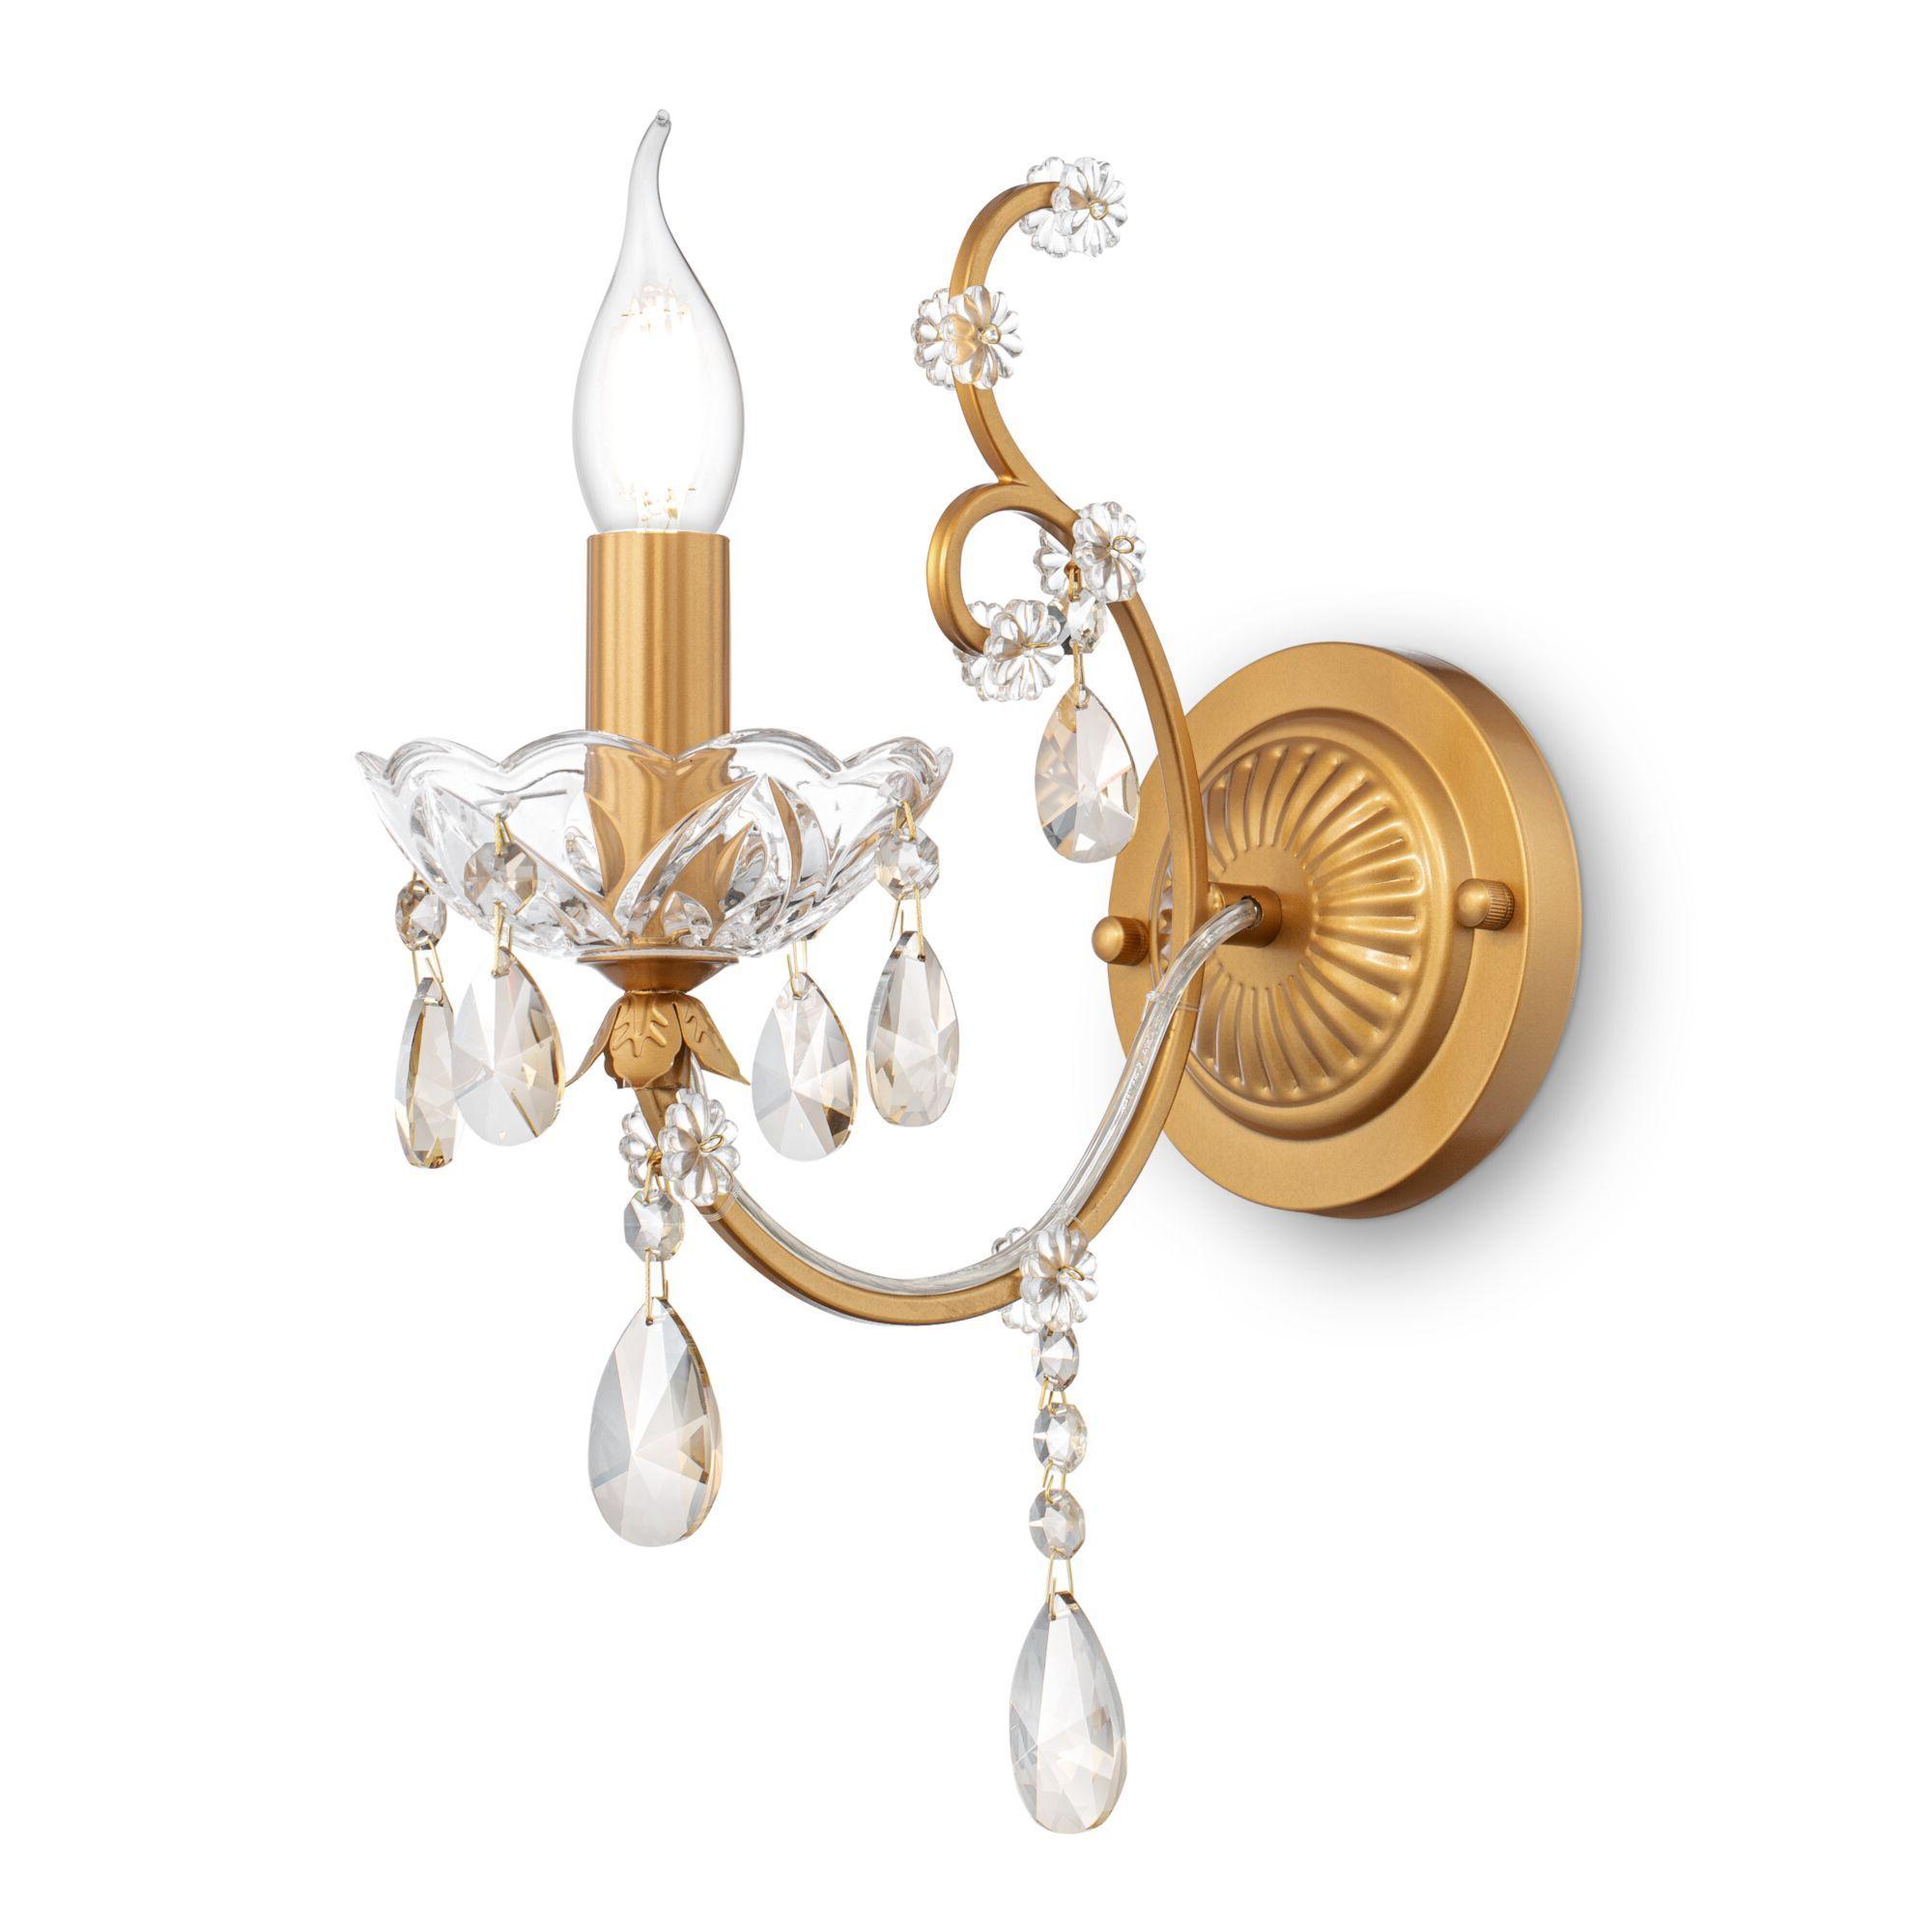 Бра Maytoni Royal Classic Sevilla DIA004-01-G, 1xE14x60W, золото с прозрачным, коньячный, металл со стеклом, хрусталь - фото 1